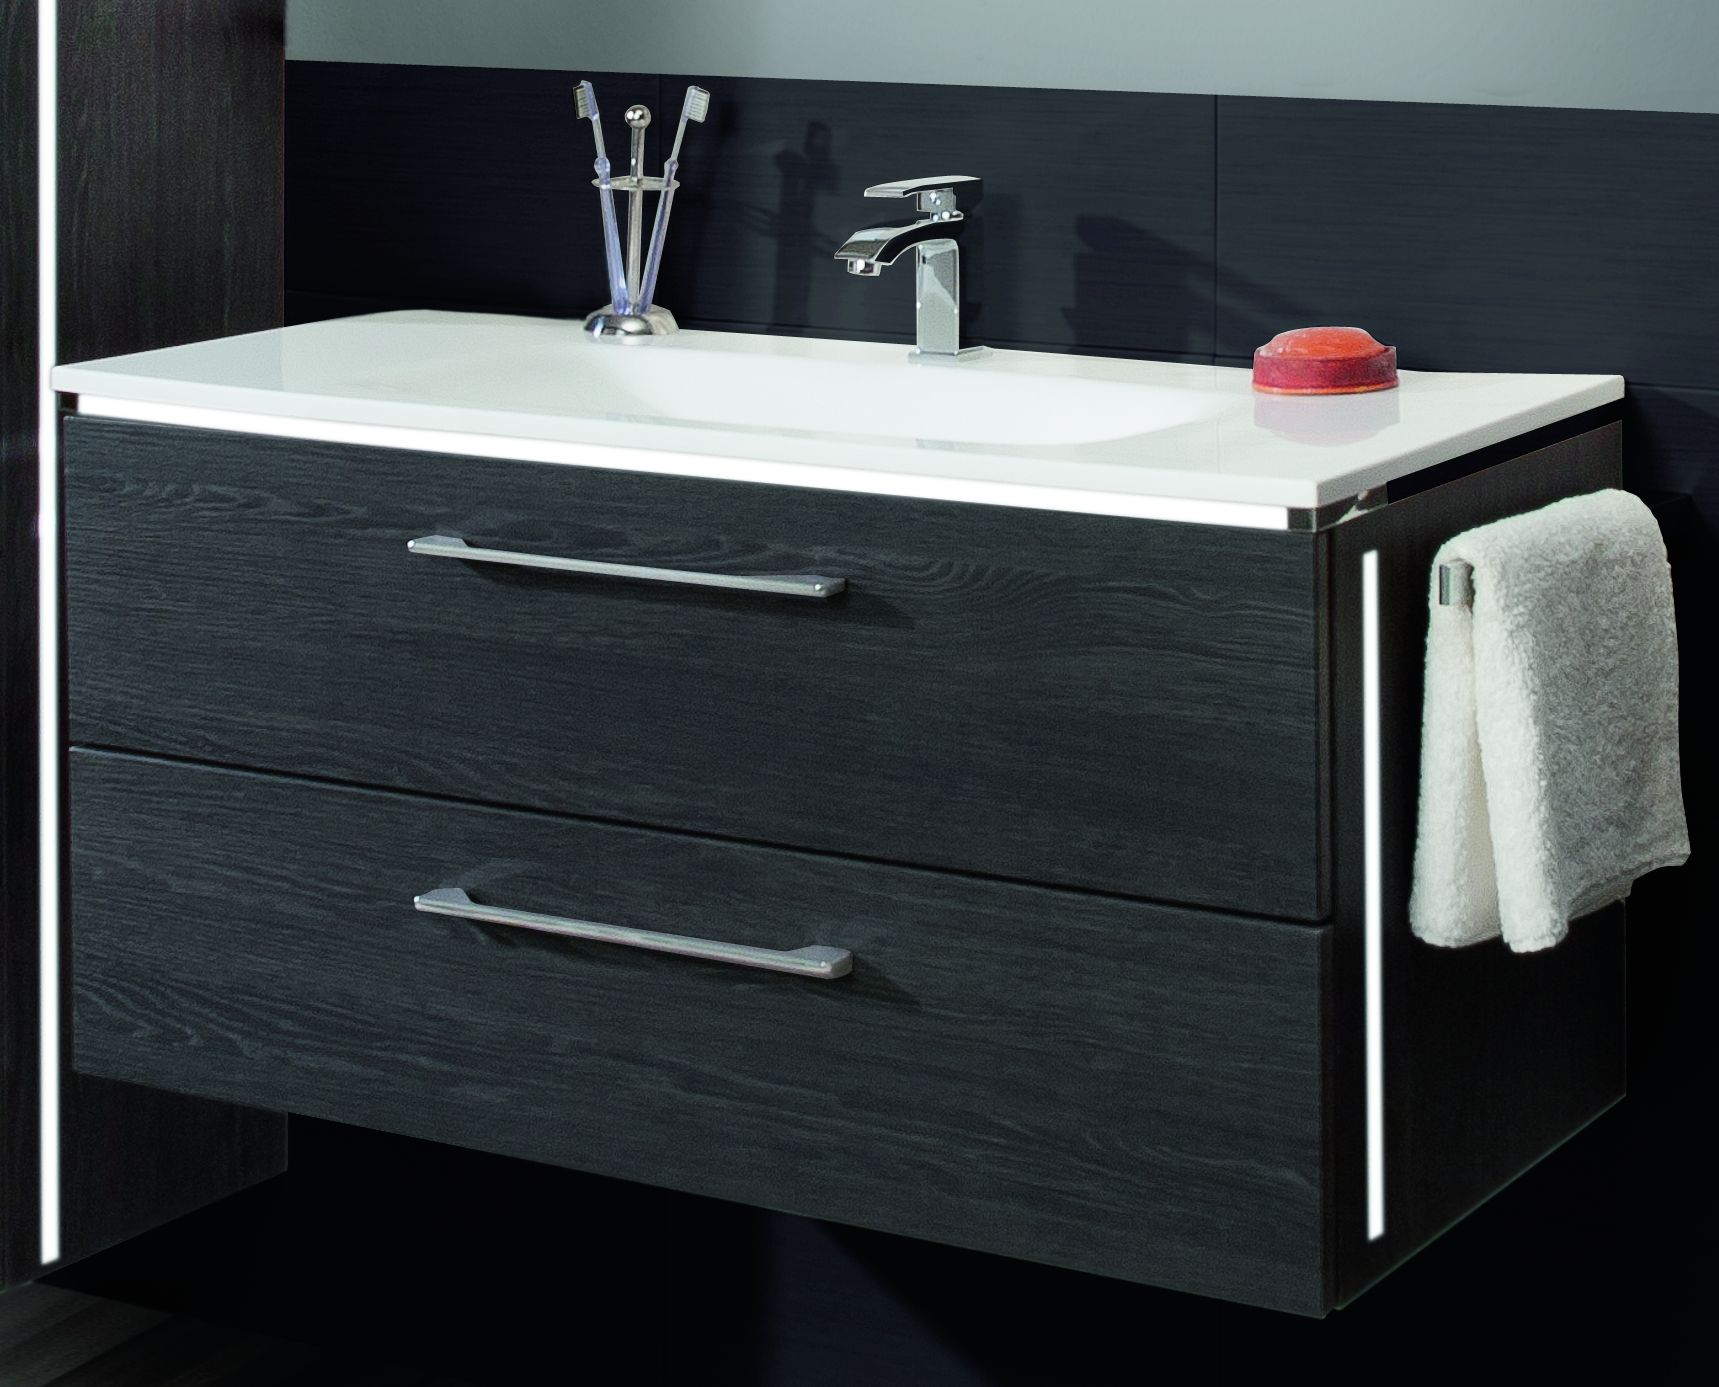 marlin mybad waschplatz loft 100 cm g nstig kaufen m bel universum. Black Bedroom Furniture Sets. Home Design Ideas